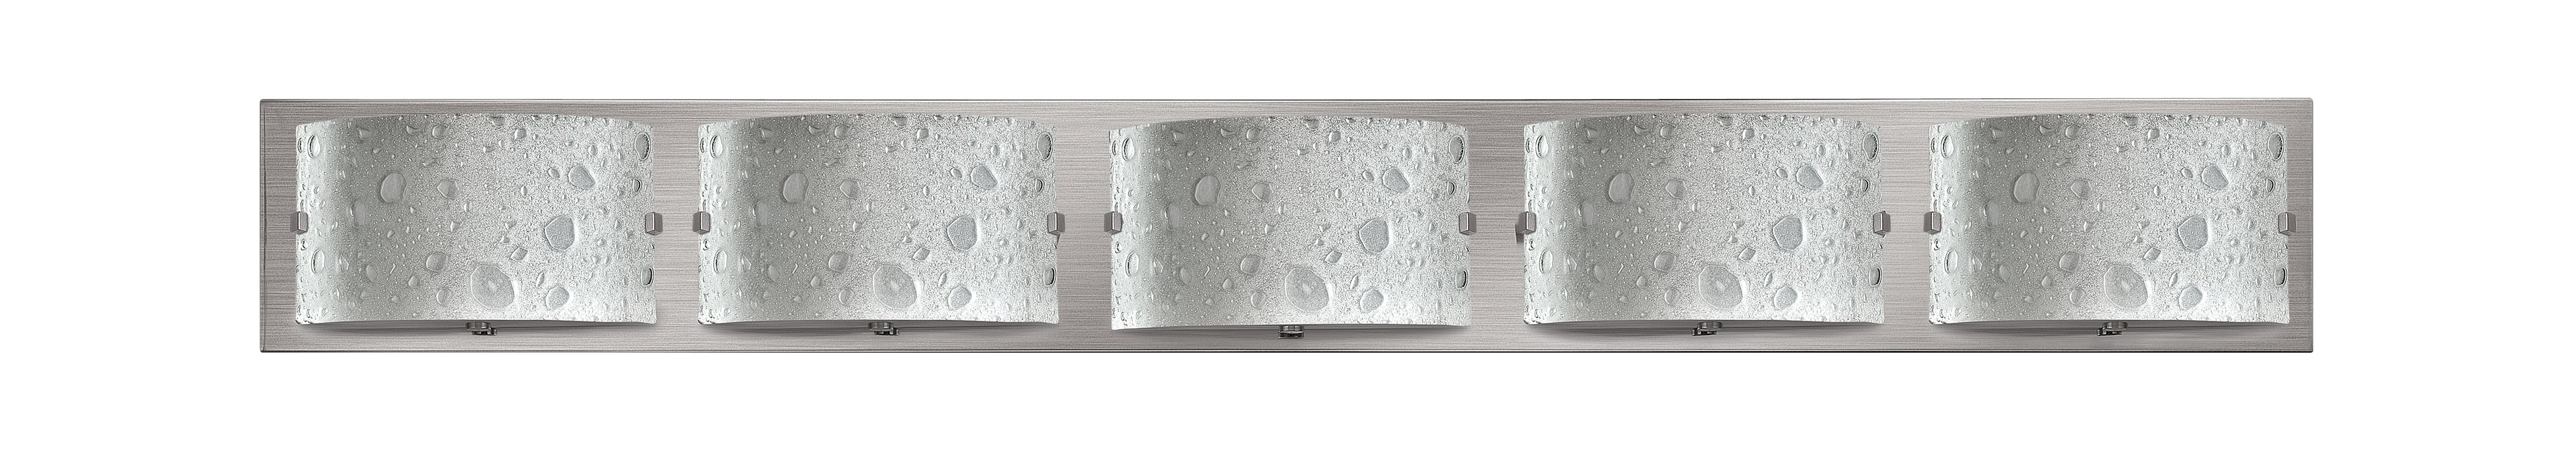 Hinkley 5925BN Brushed Nickel Contemporary Daphne Bathroom Light